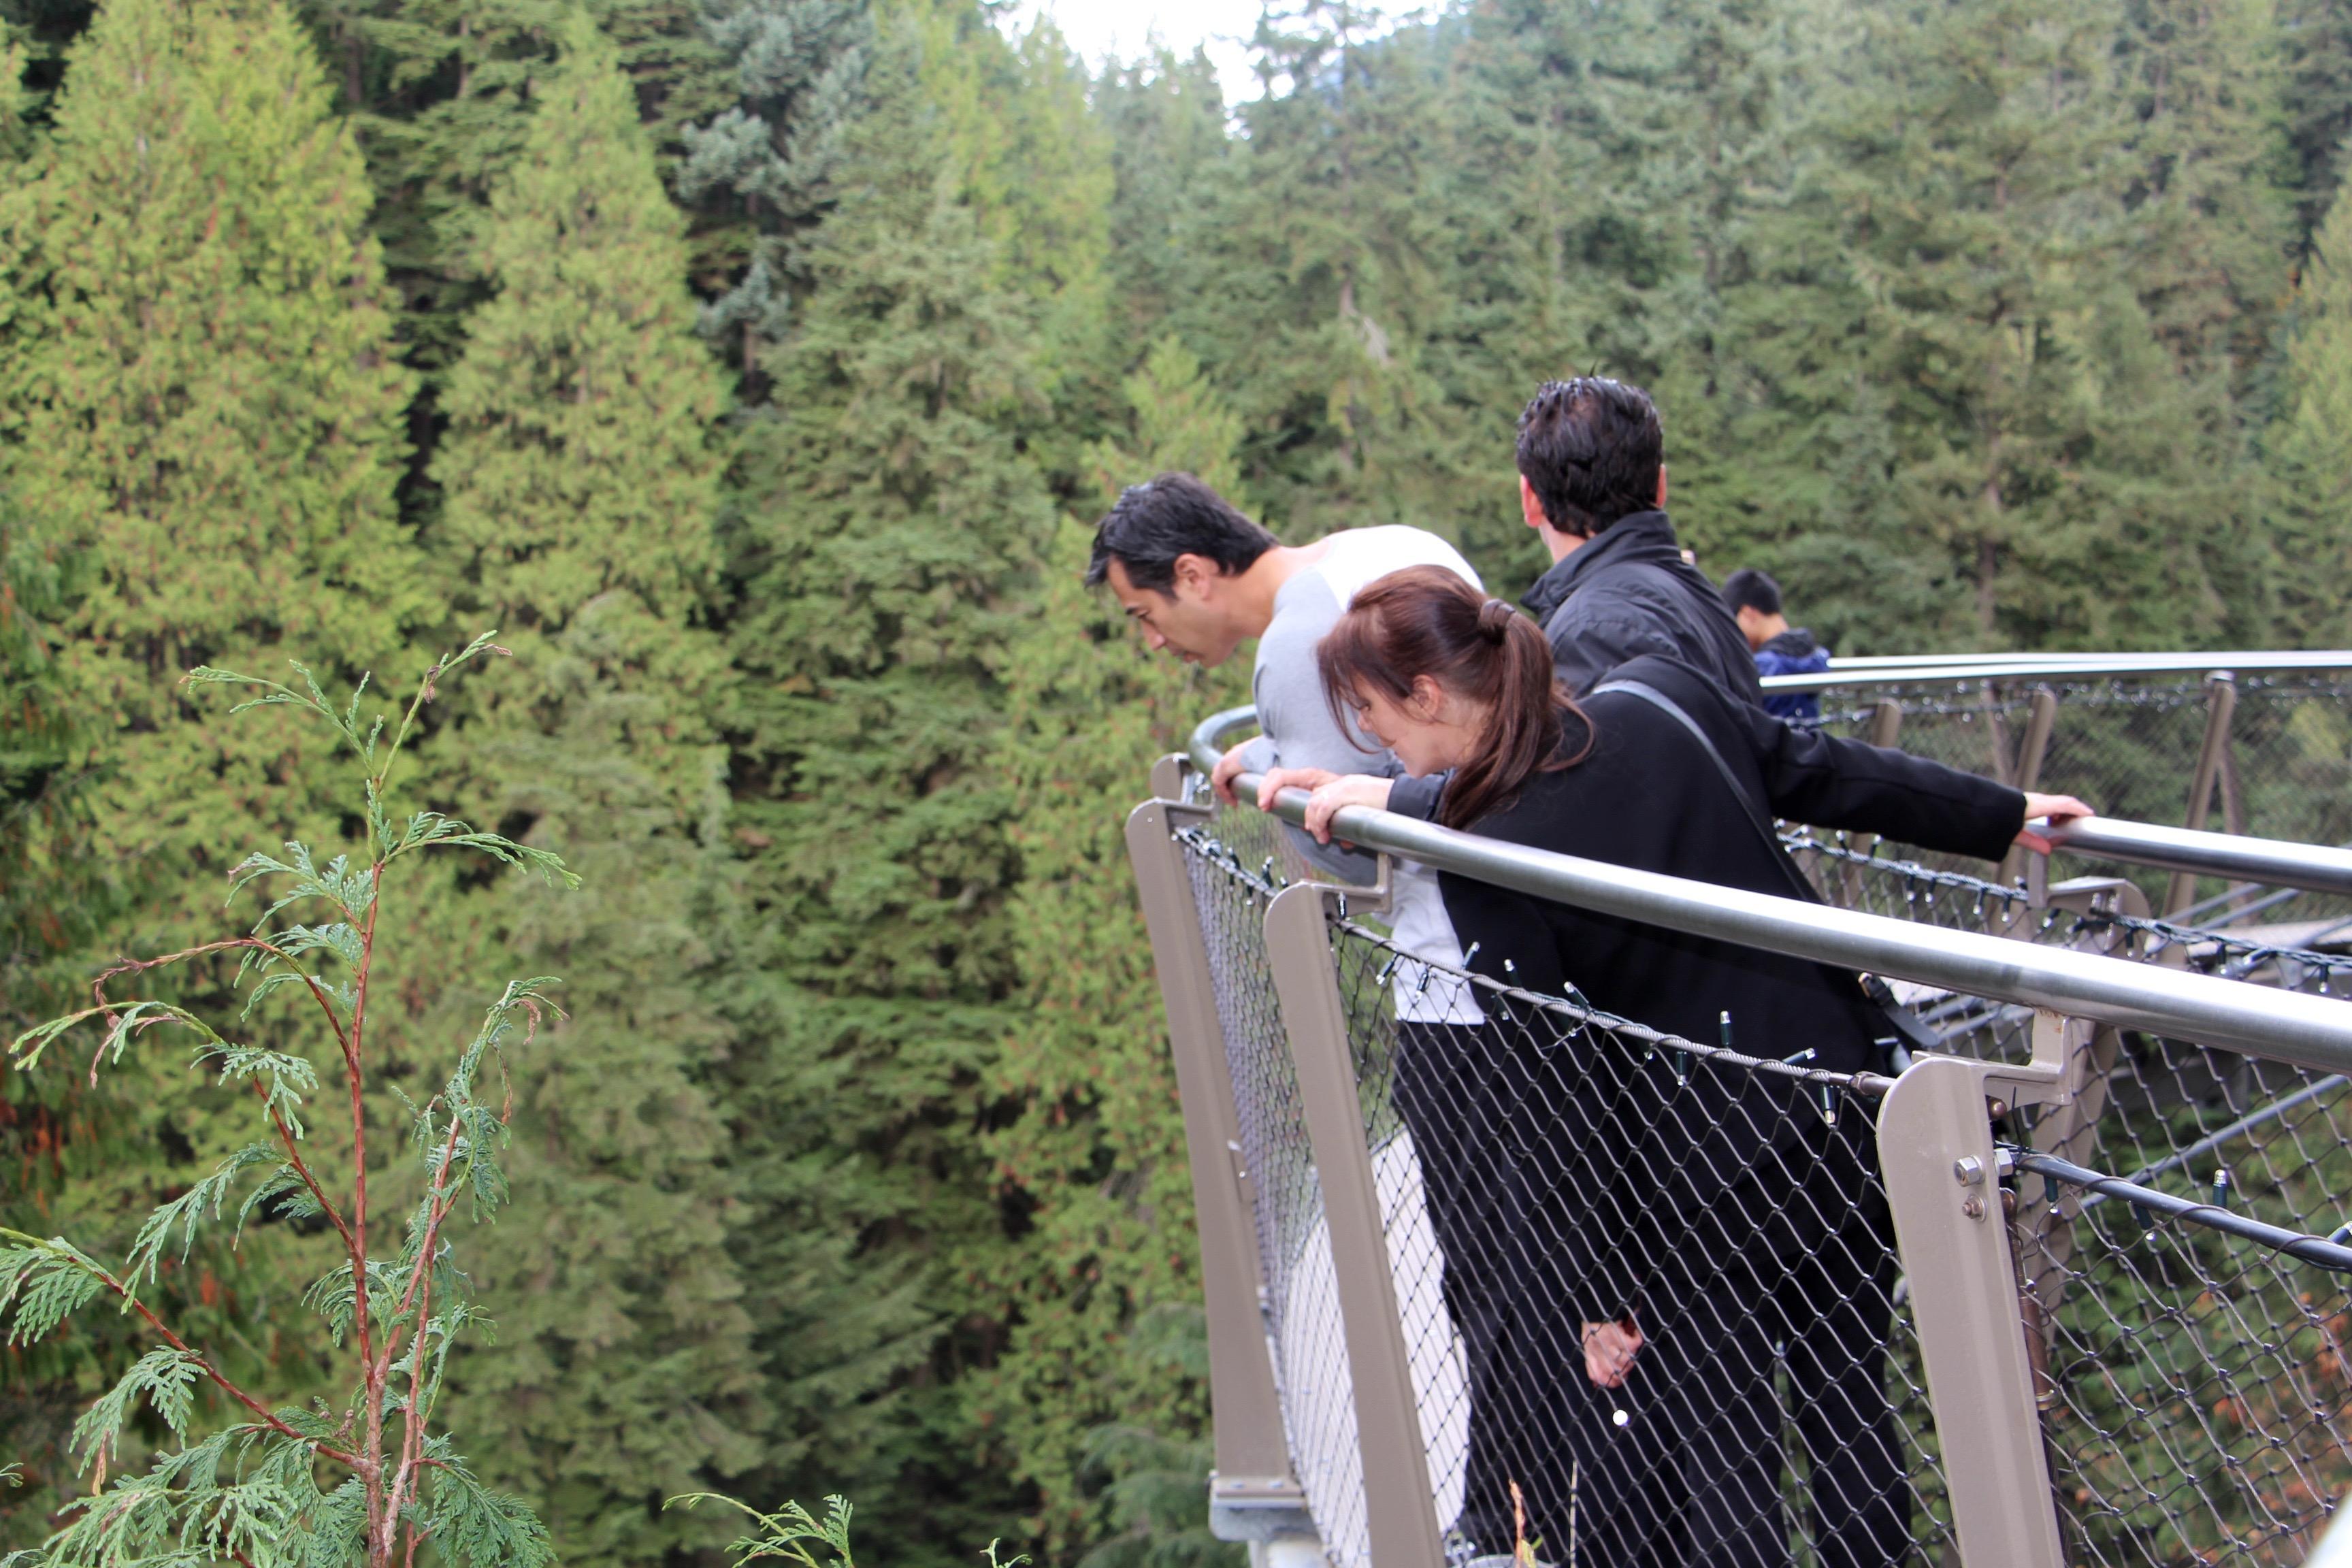 Vancouver Day Tour Amp Capilano Suspension Bridge Private Tour  VanCity Tours